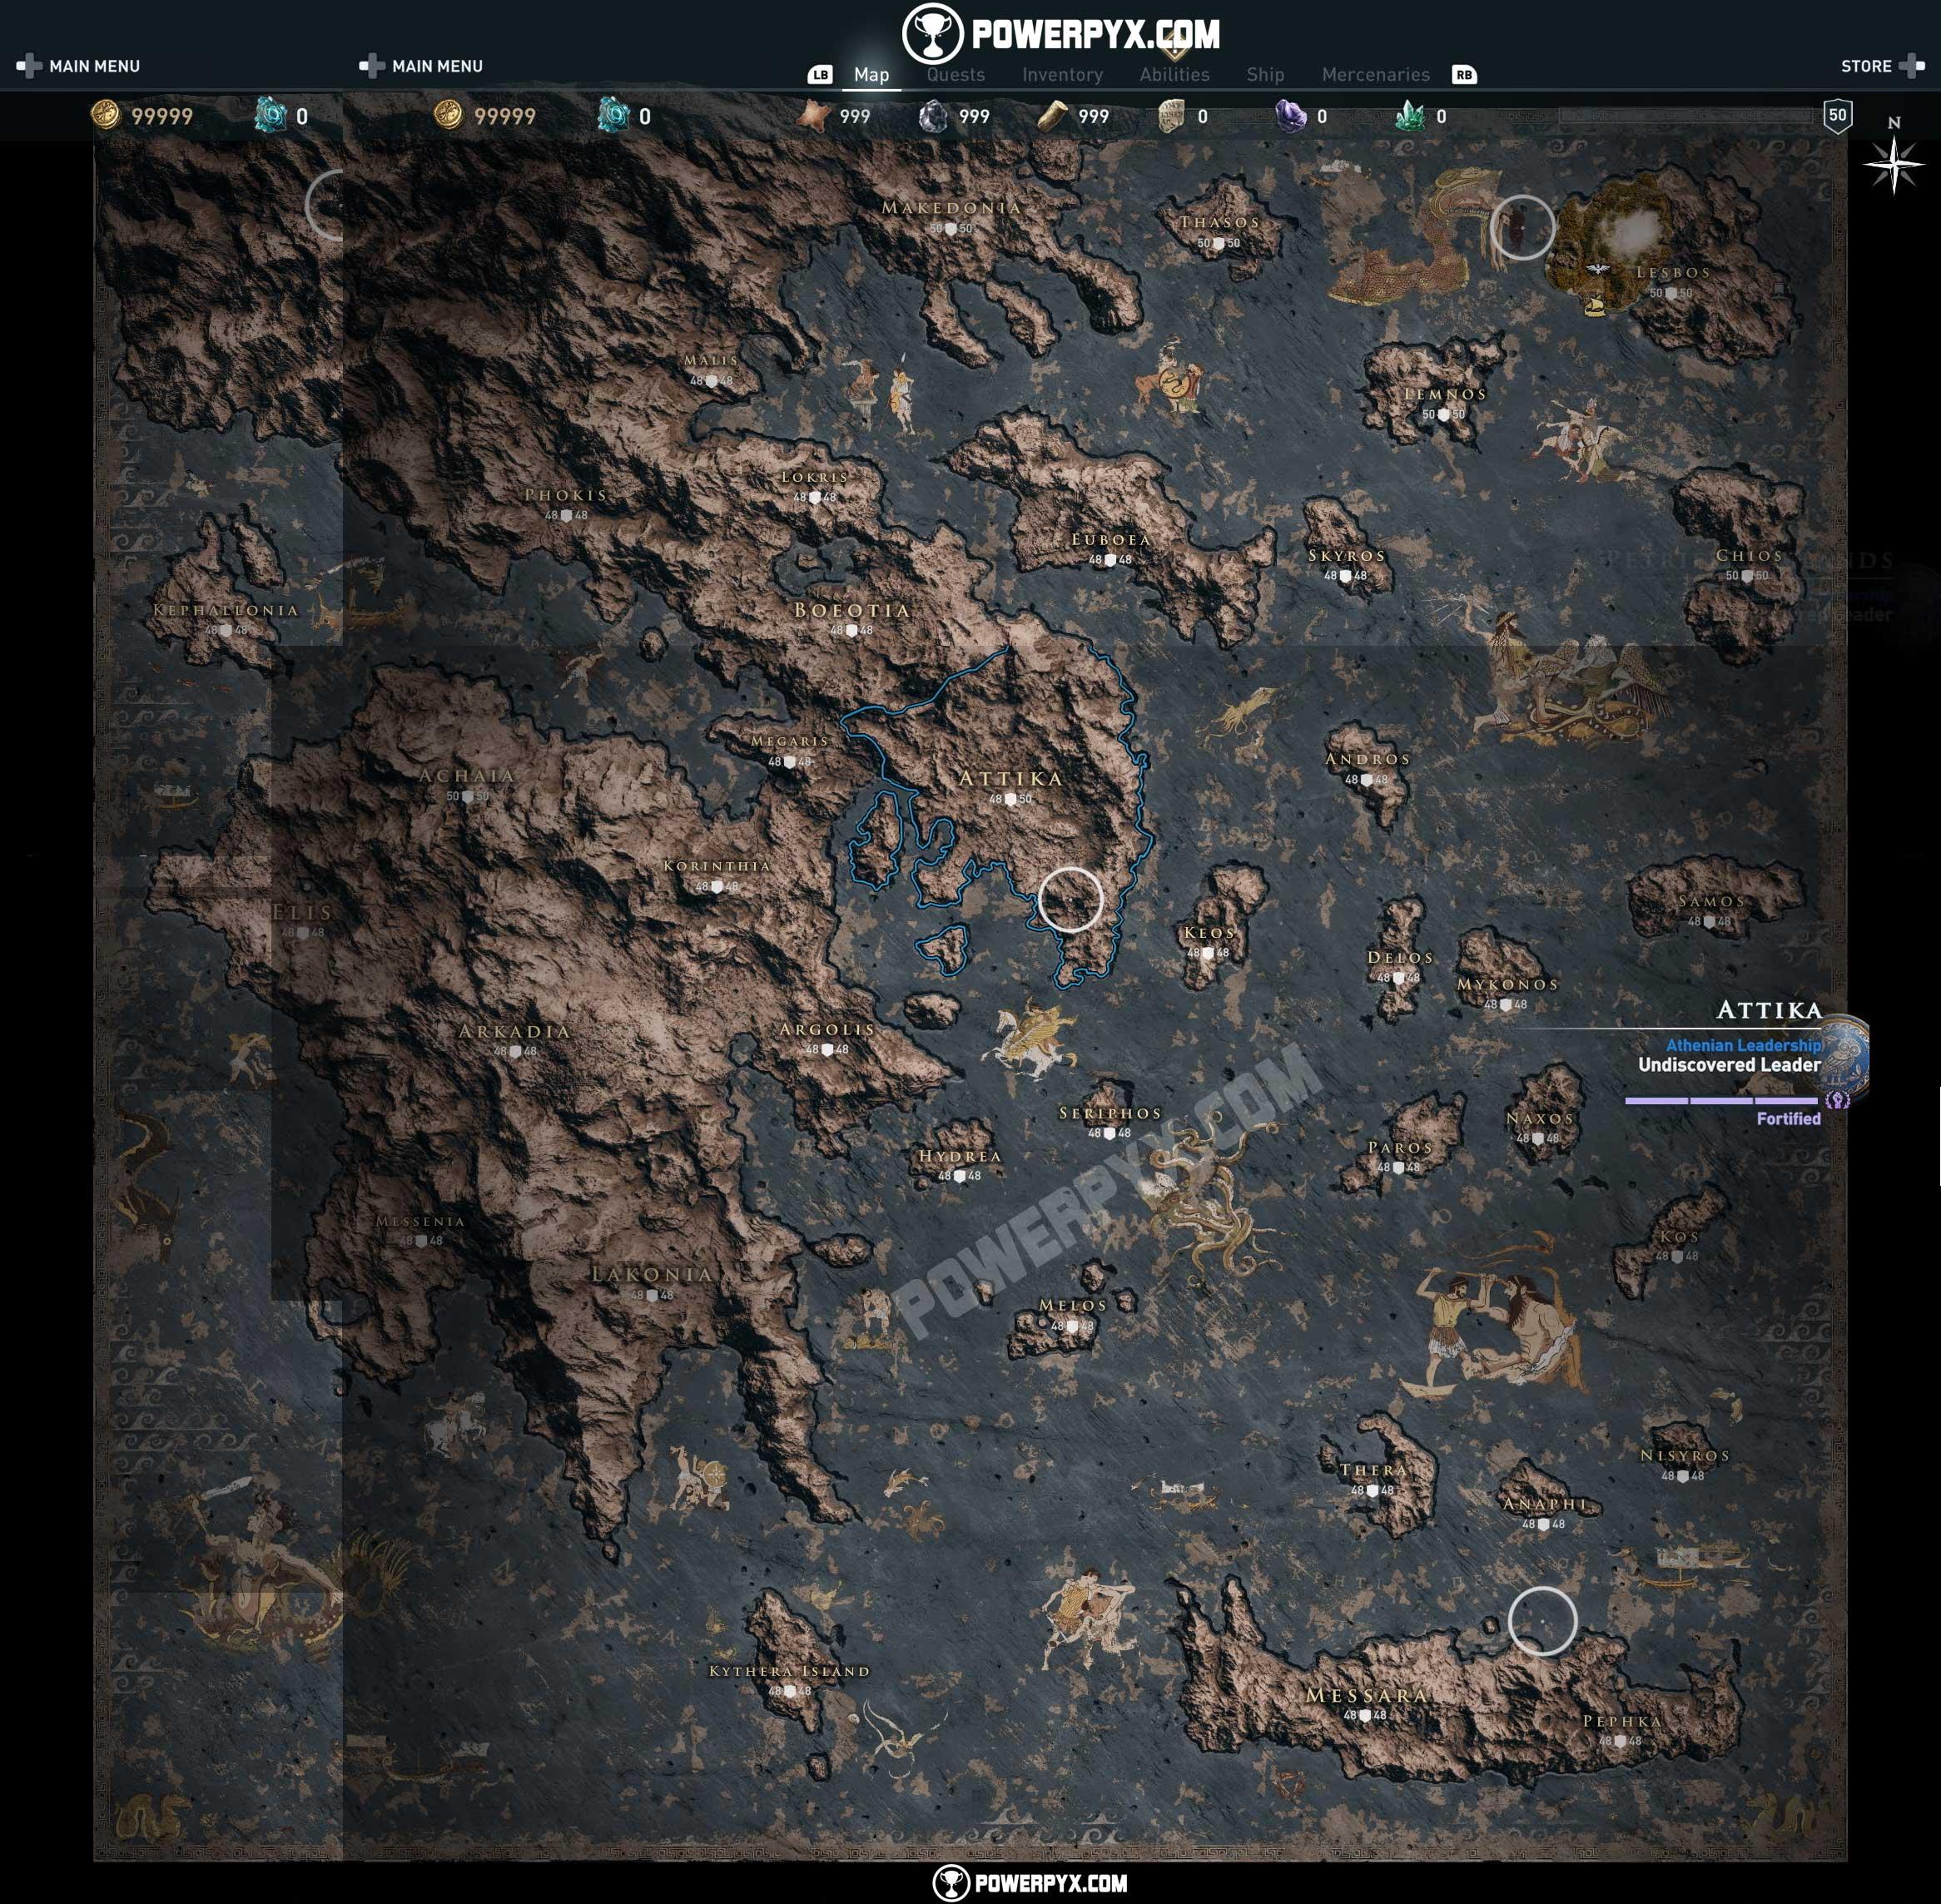 Revelan el mapa completo de Assassin's Creed Odyssey